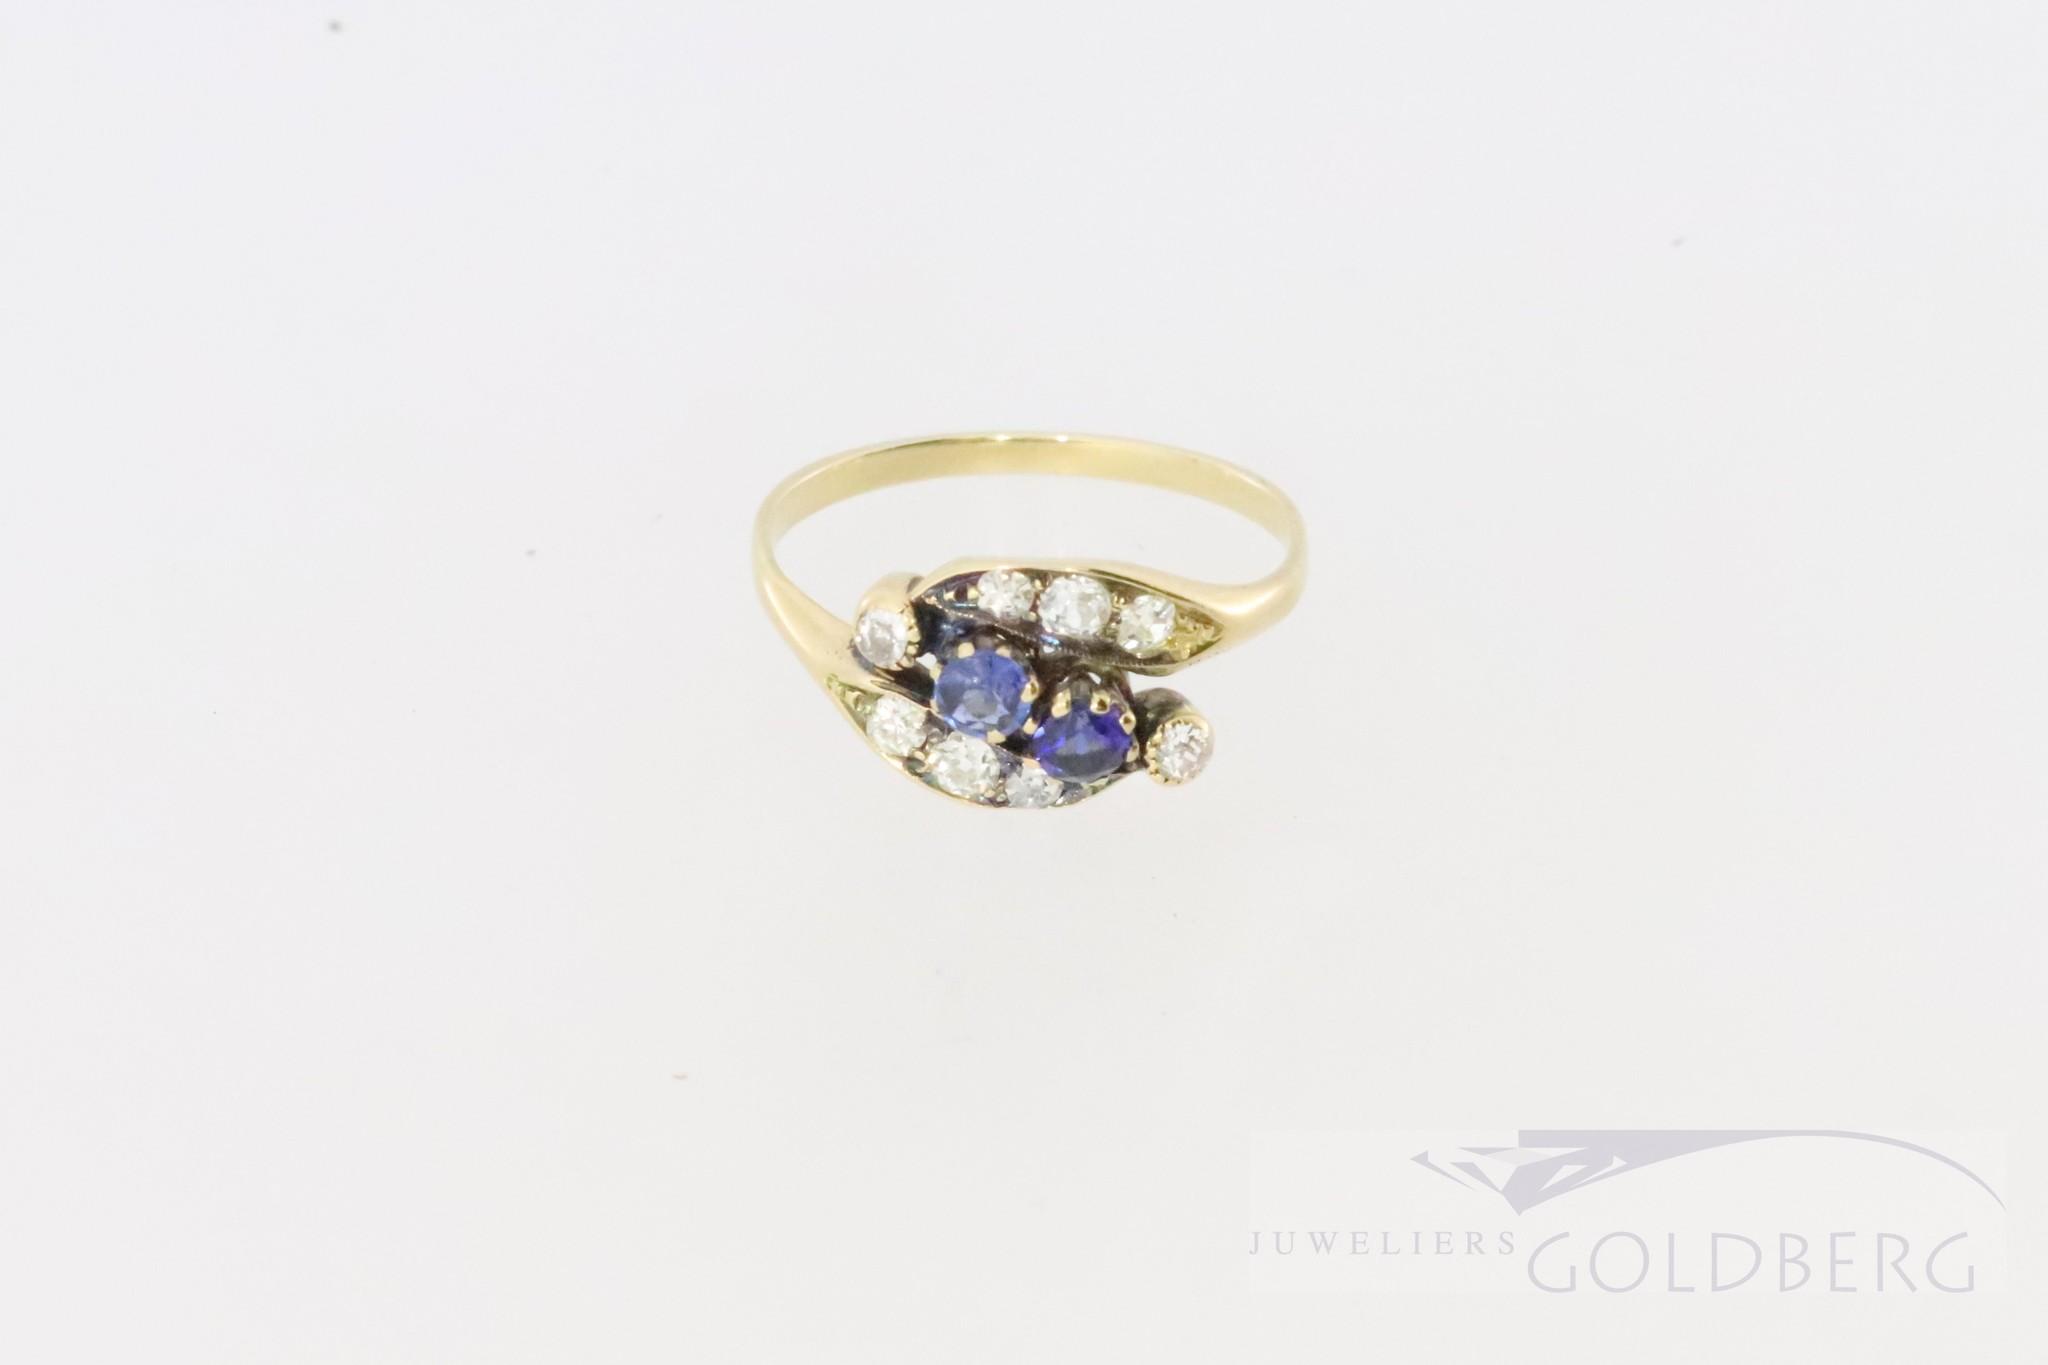 14k bolshevik ring with diamond and sapphire